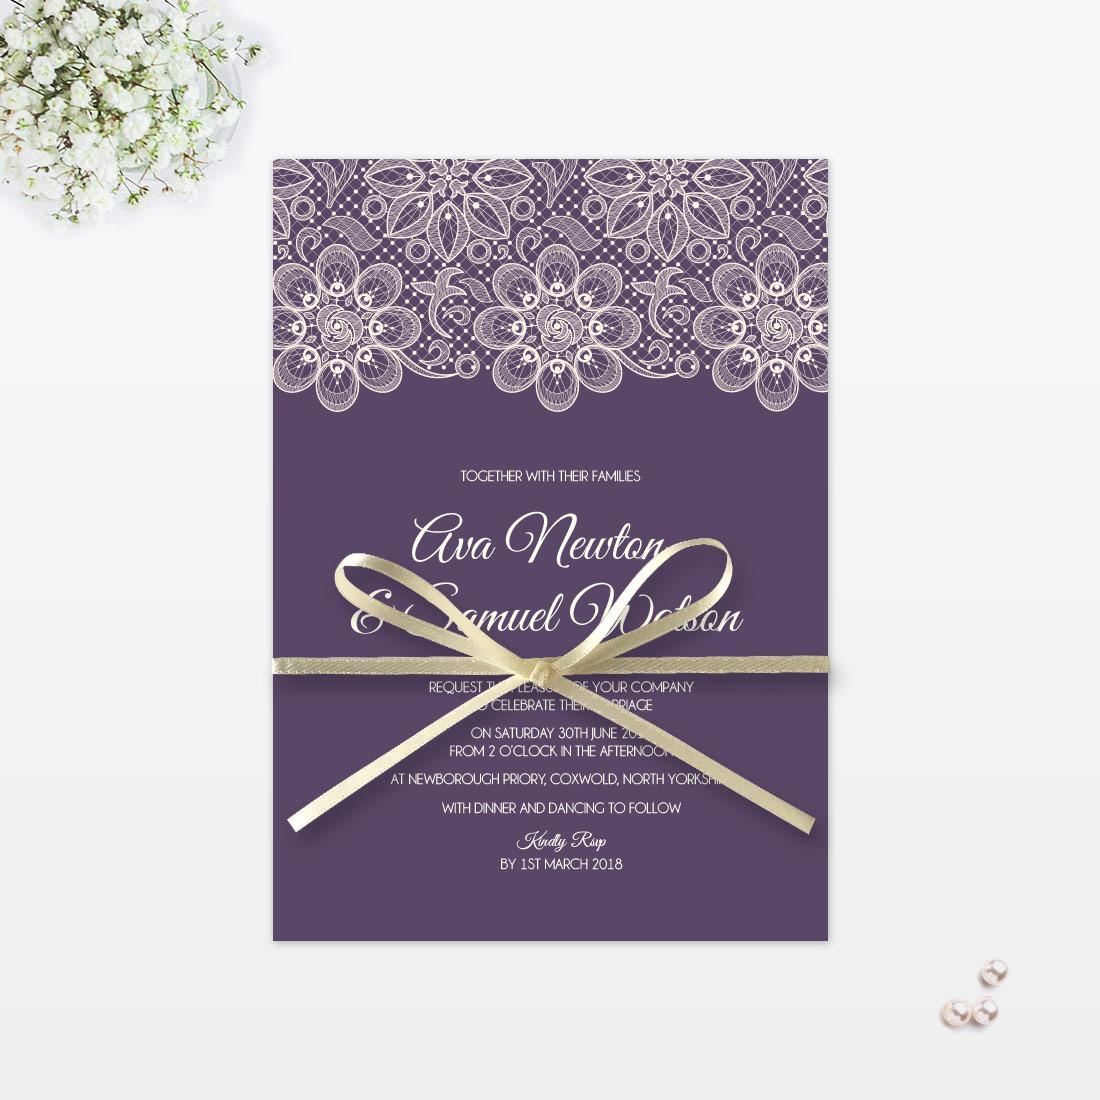 Floral Lace Wedding Invitation - Love Invited - Luxury Wedding ...